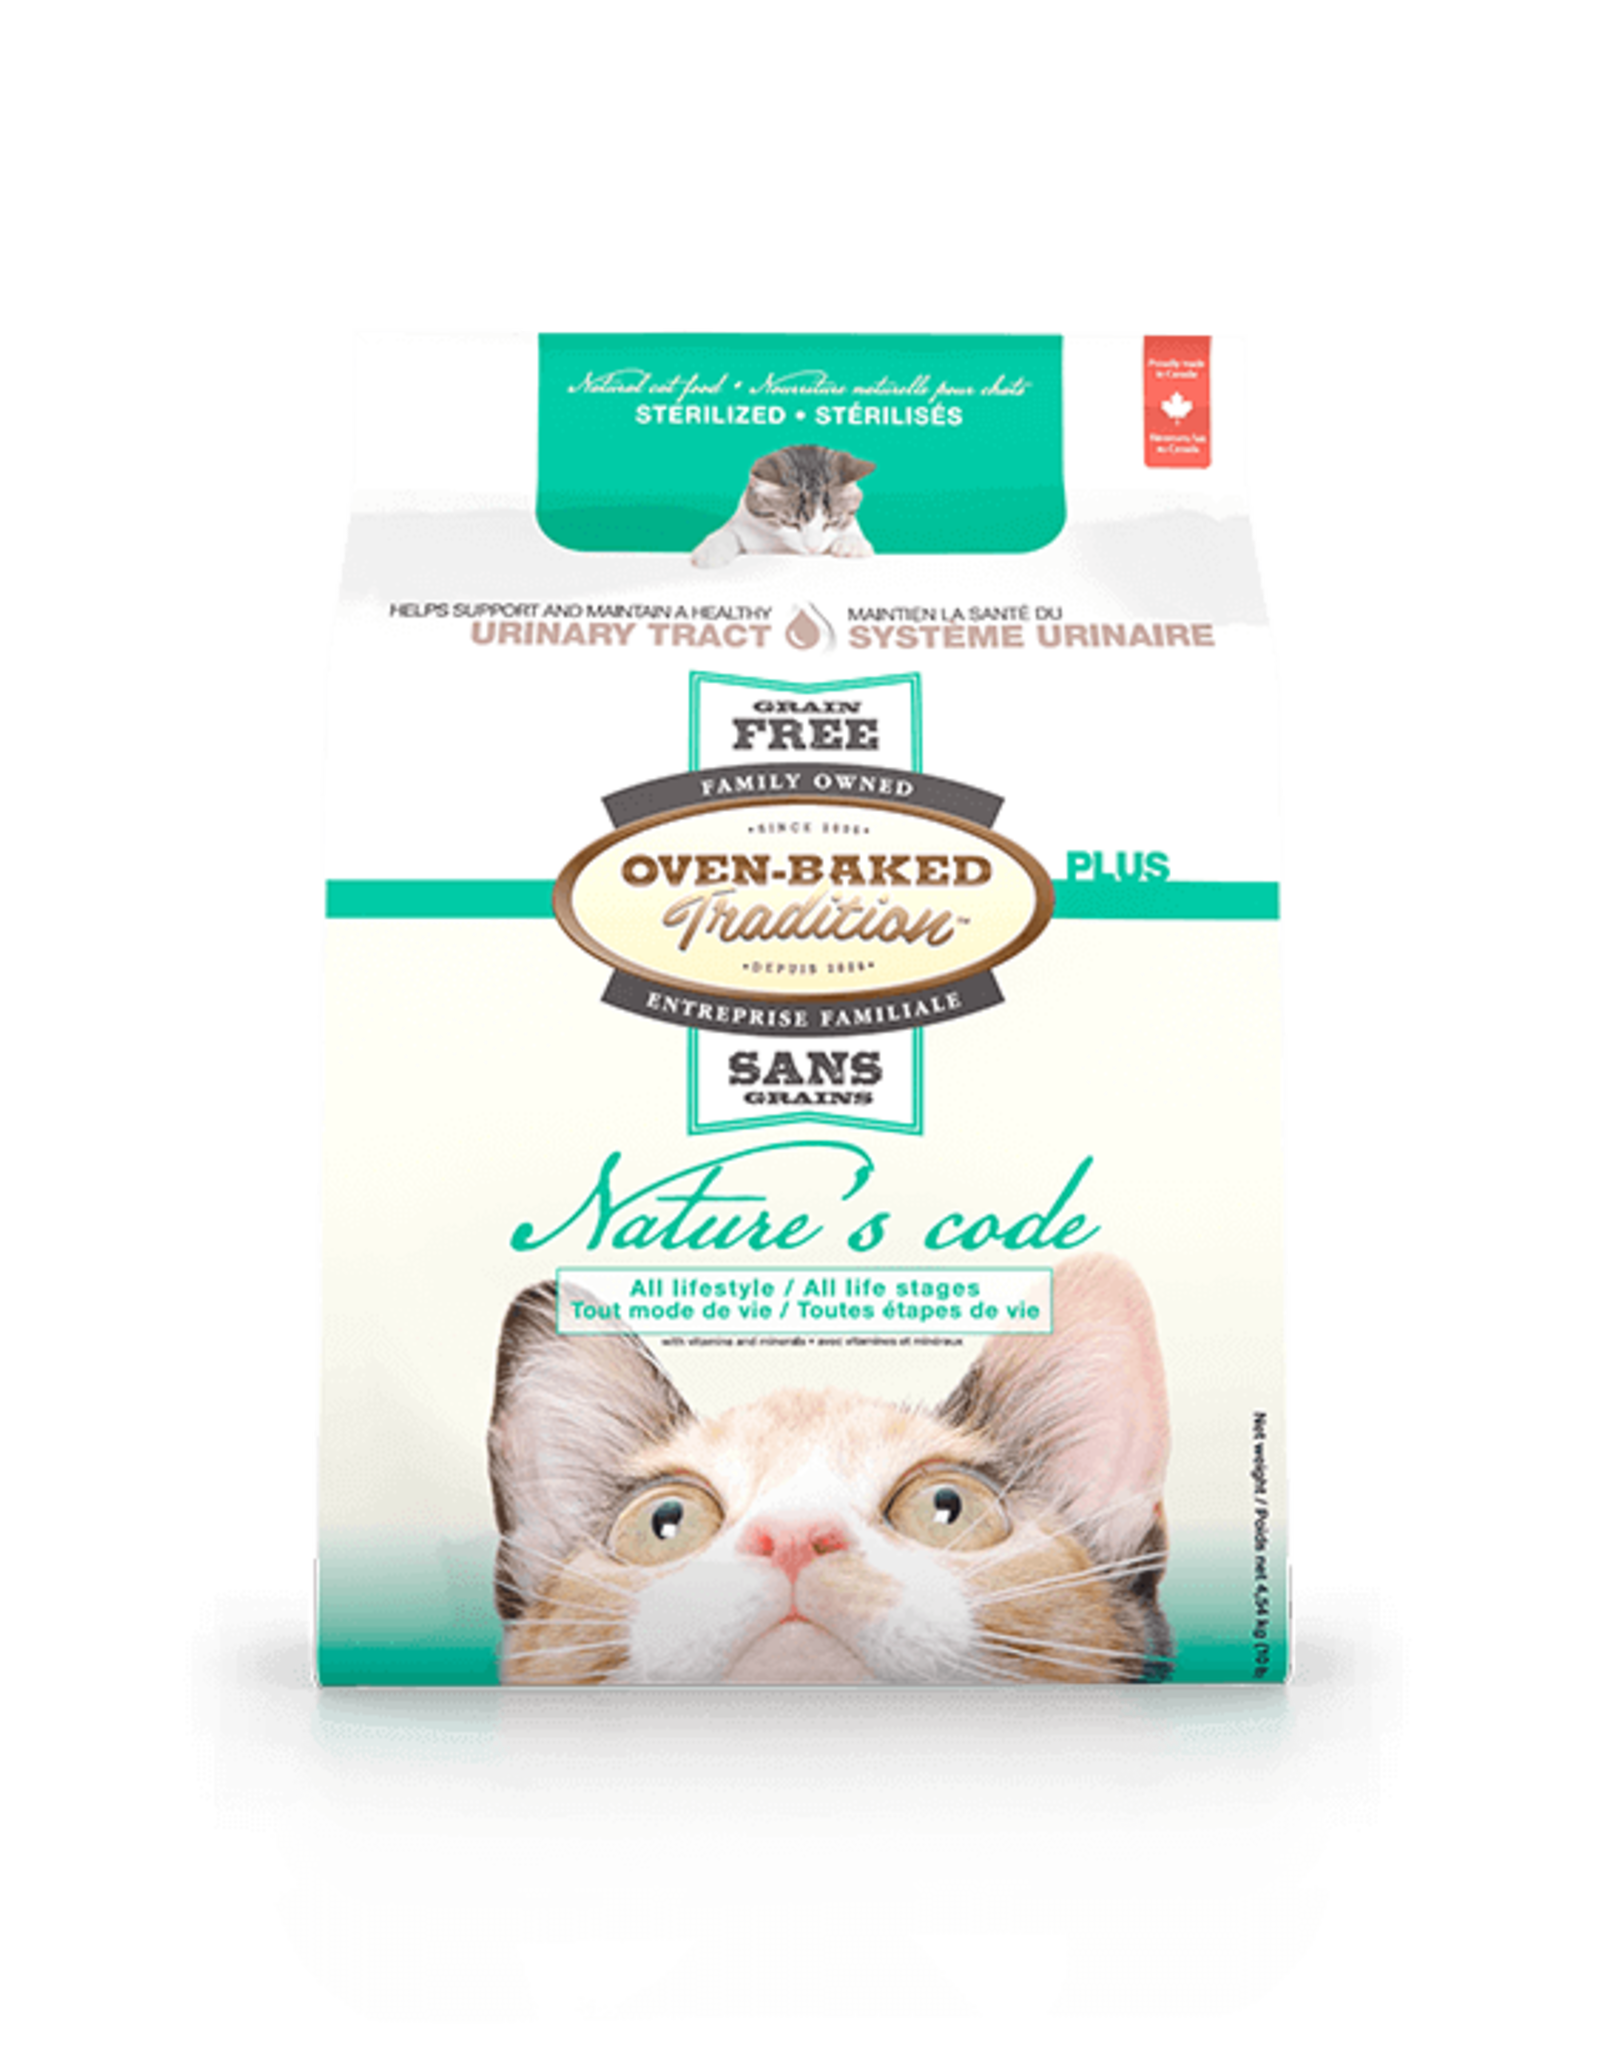 Oven Baked Tradition Oven Baked Tradition Natures Code Cat Urinary Food 2.5lbs